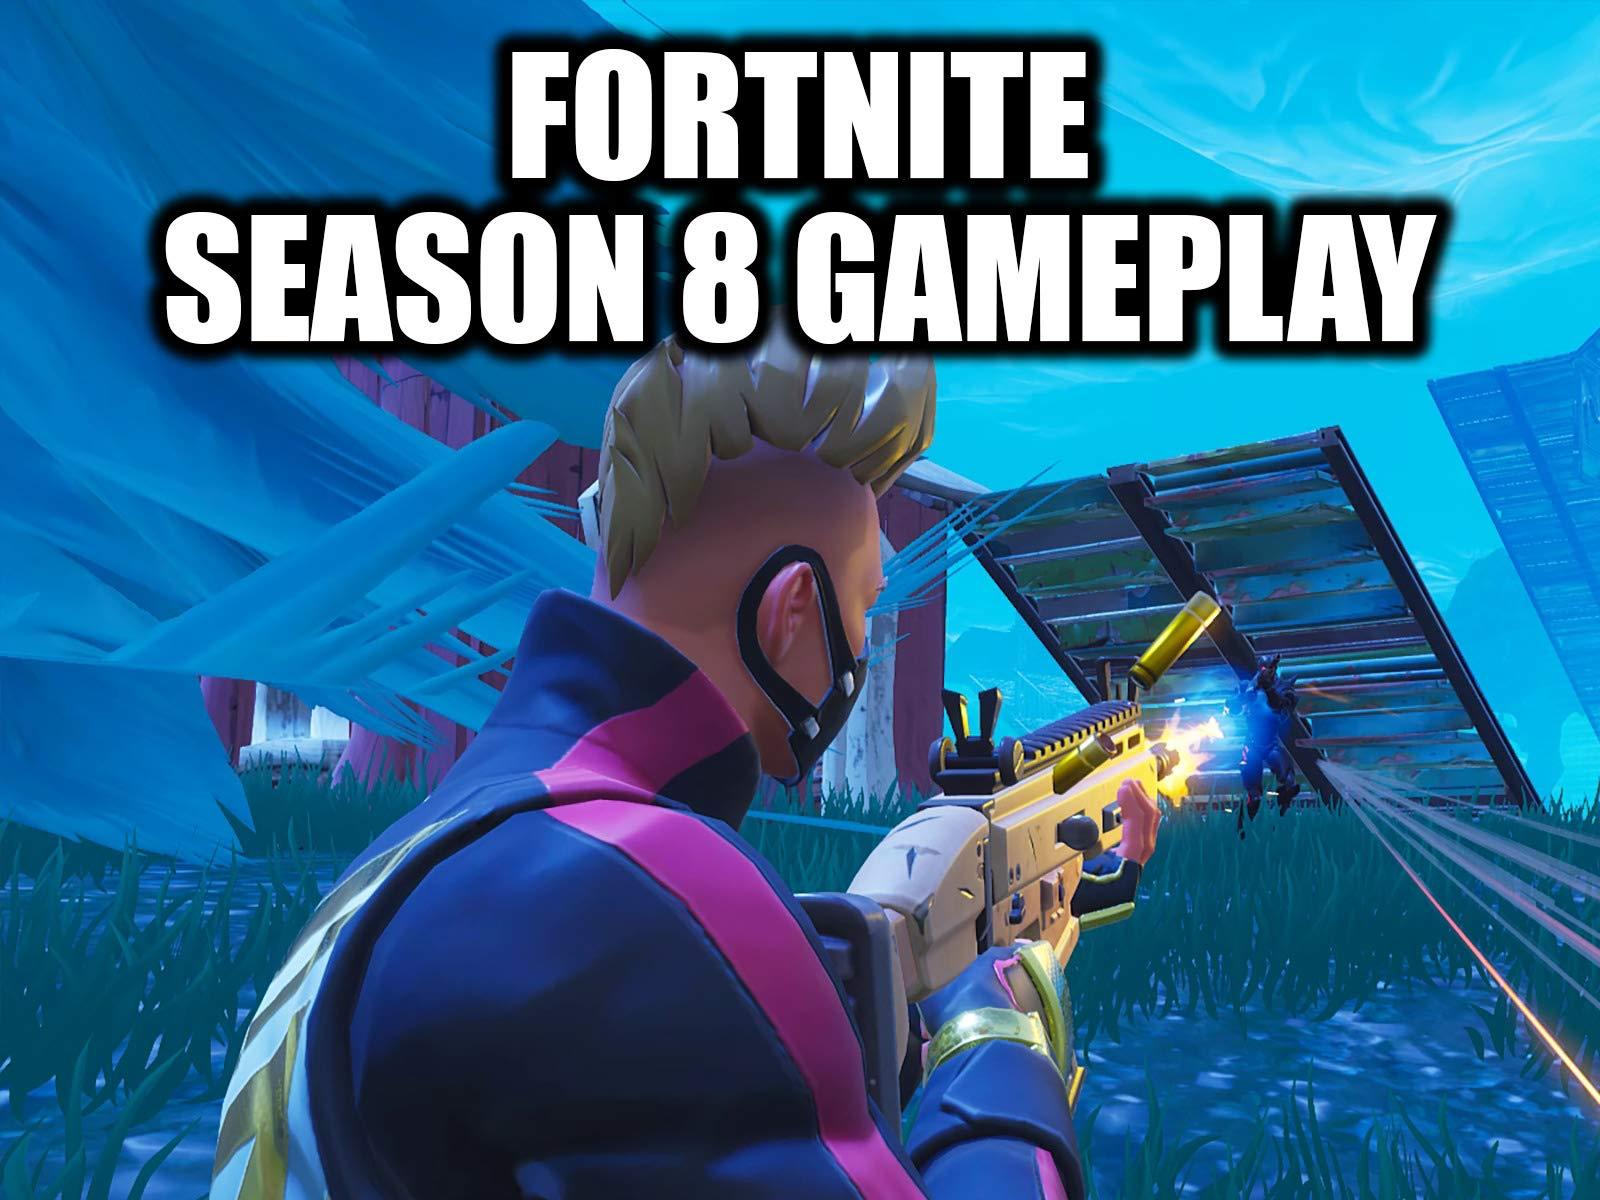 Watch Clip: Fortnite Season 8 Gameplay | Prime Video